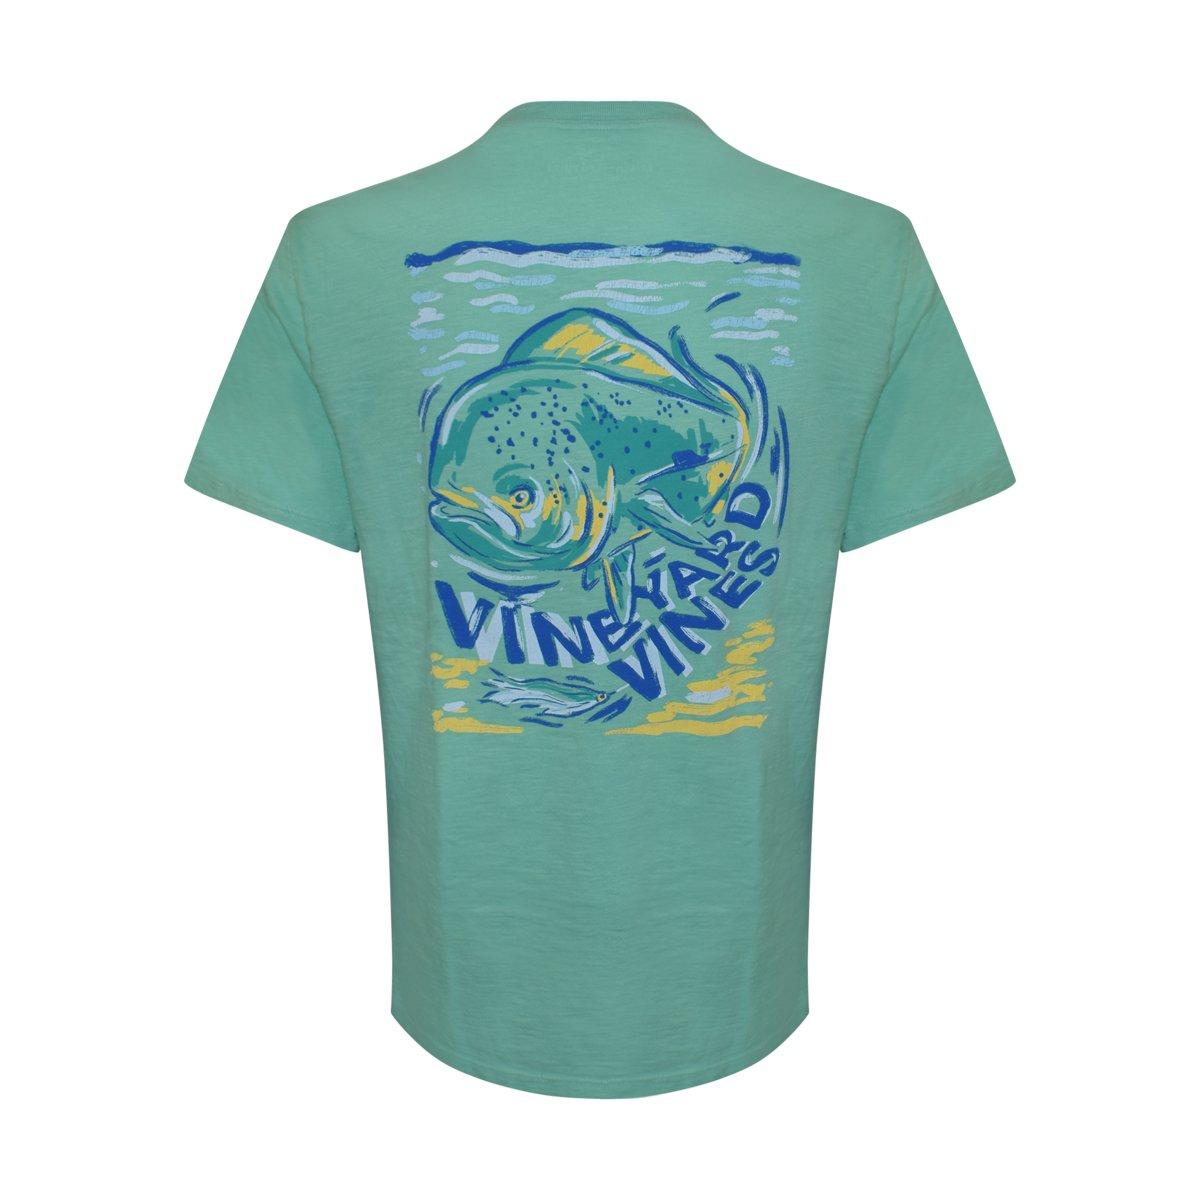 Vineyard Vinesメンズ半袖City Whale Teeシャツ B07DCW86GH Large|Antigua Green/Painted Mahi Antigua Green/Painted Mahi Large